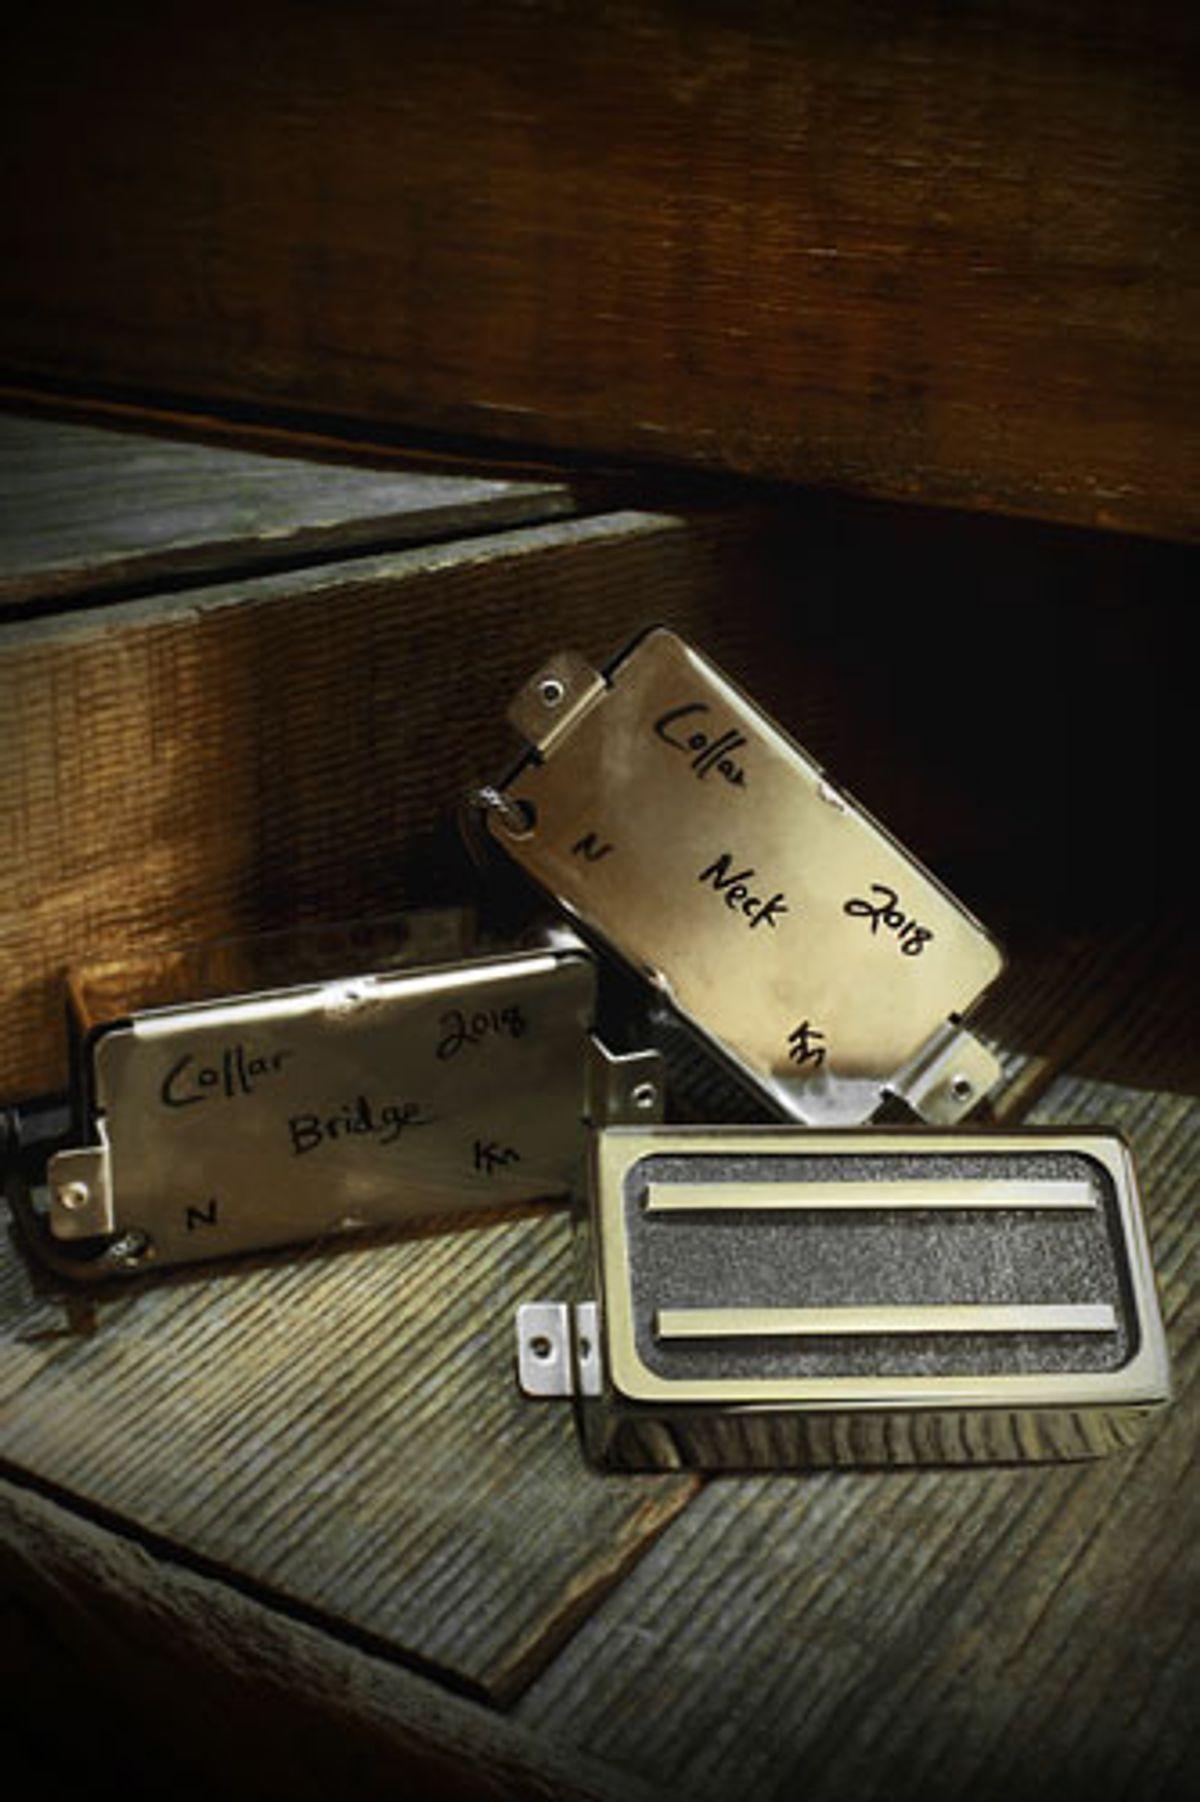 Lollar Announces Release of dB Humbucker Pickup